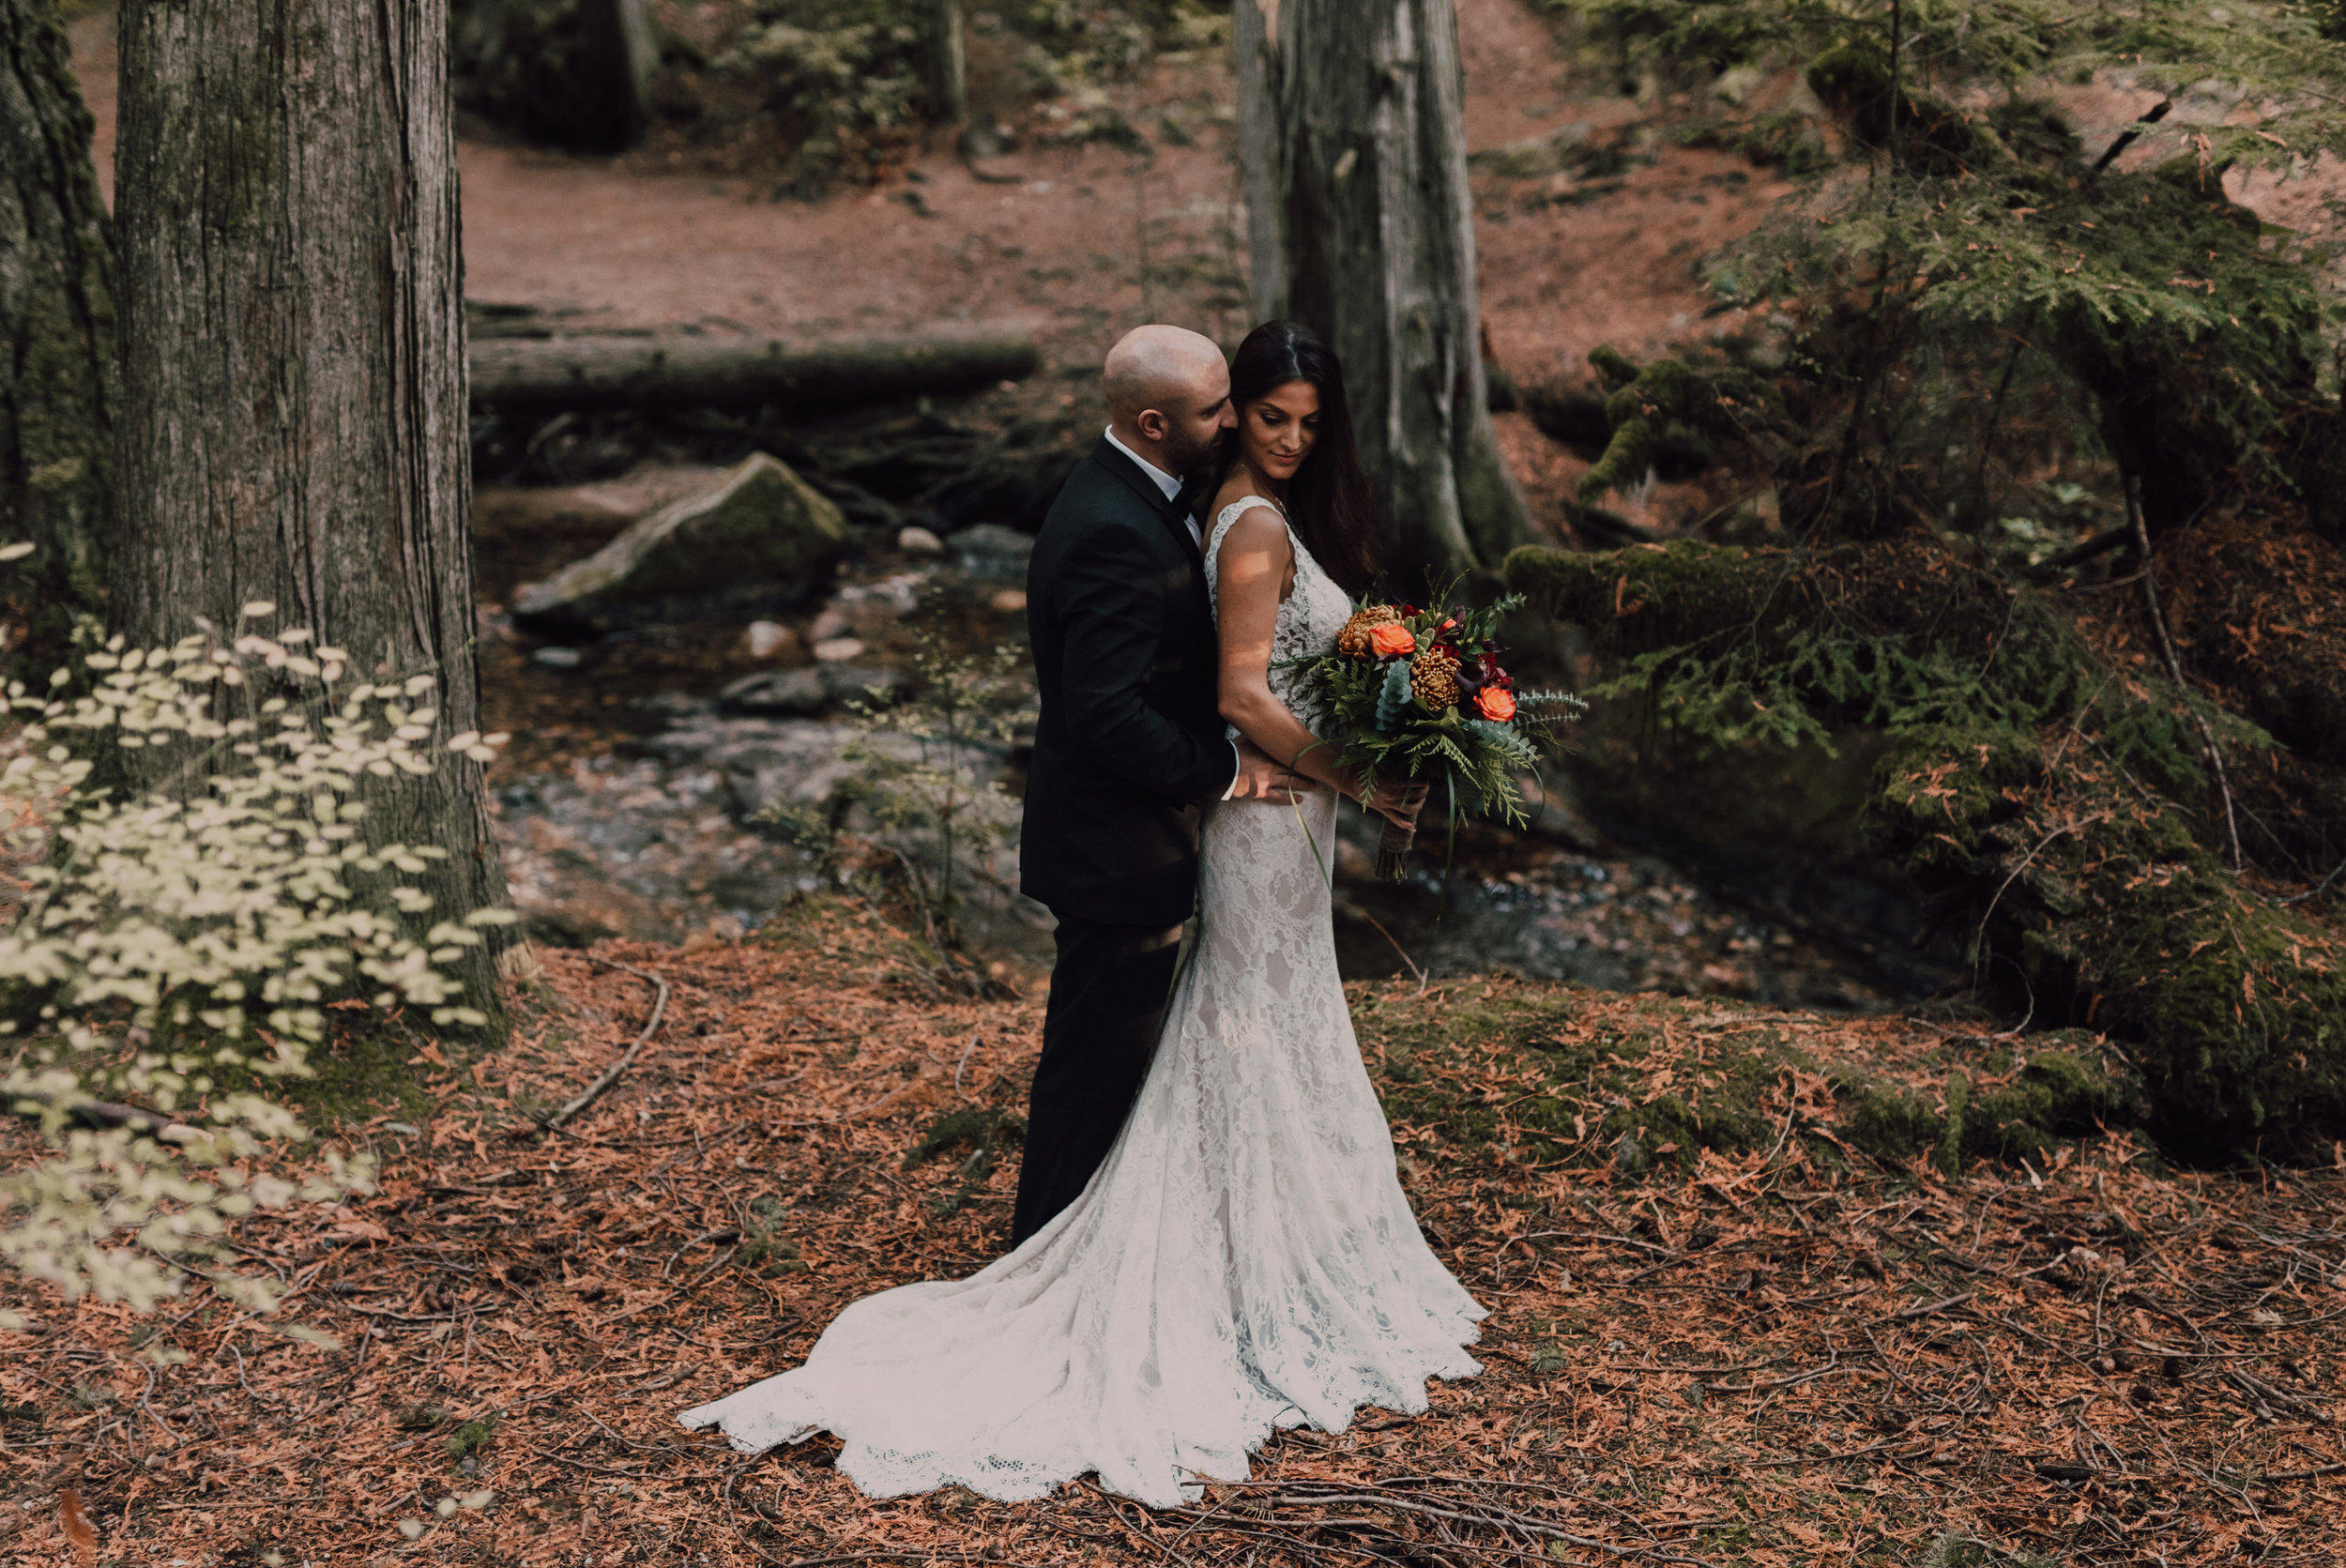 Day After Wedding Photos - Sunshine Coast Wedding Photos - Sunset Wedding Photos - Vancouver Wedding Photographer & Videographer - Sunshine Coast Wedding Photos - Sunshine Coast Wedding Photographer - Jennifer Picard Photography - 1A5A7498.jpg